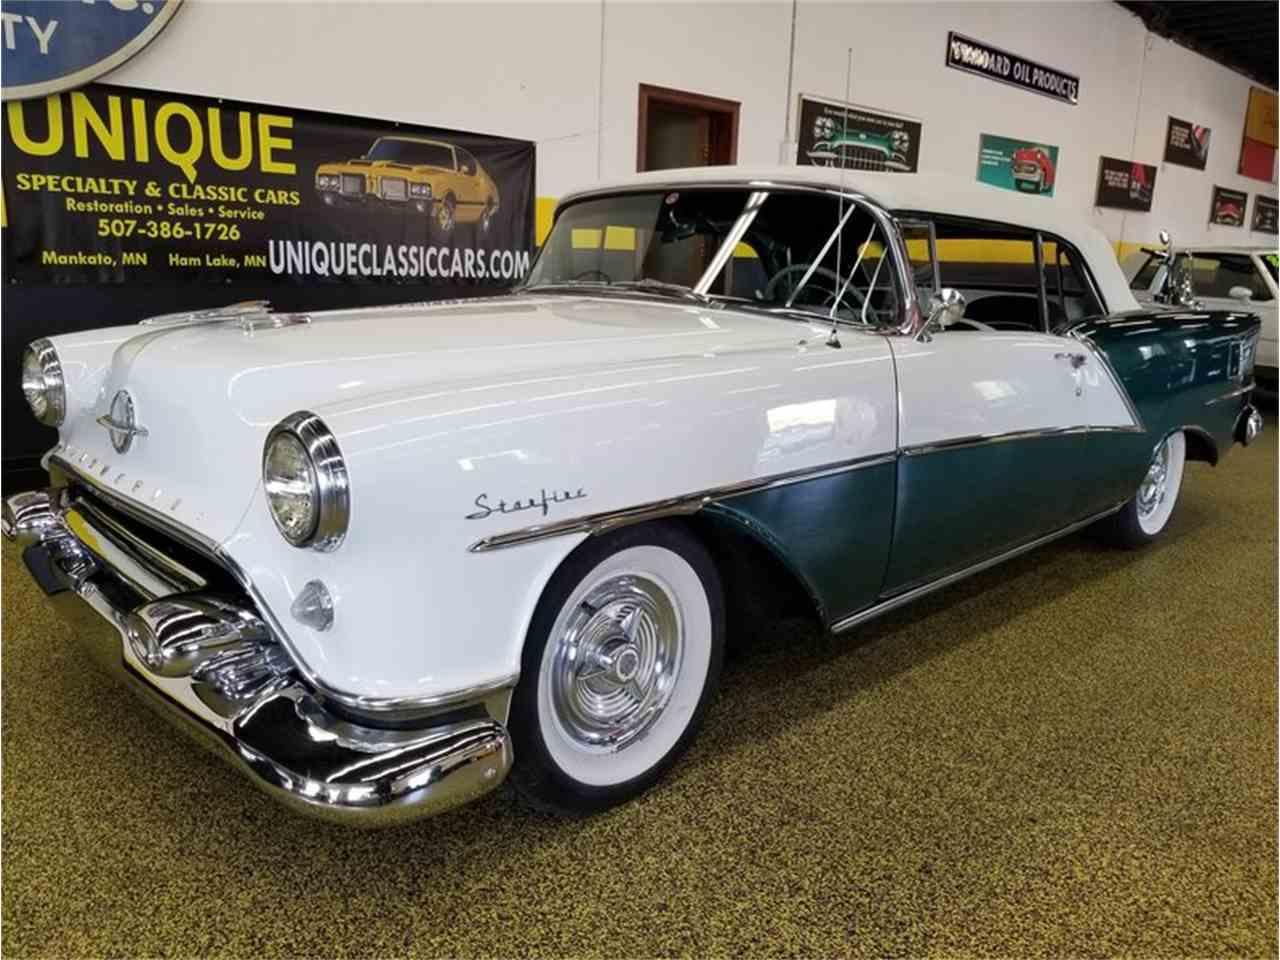 Large Picture of Classic 1954 98 Starfire Convertible located in Mankato Minnesota - $59,500.00 - LUTD